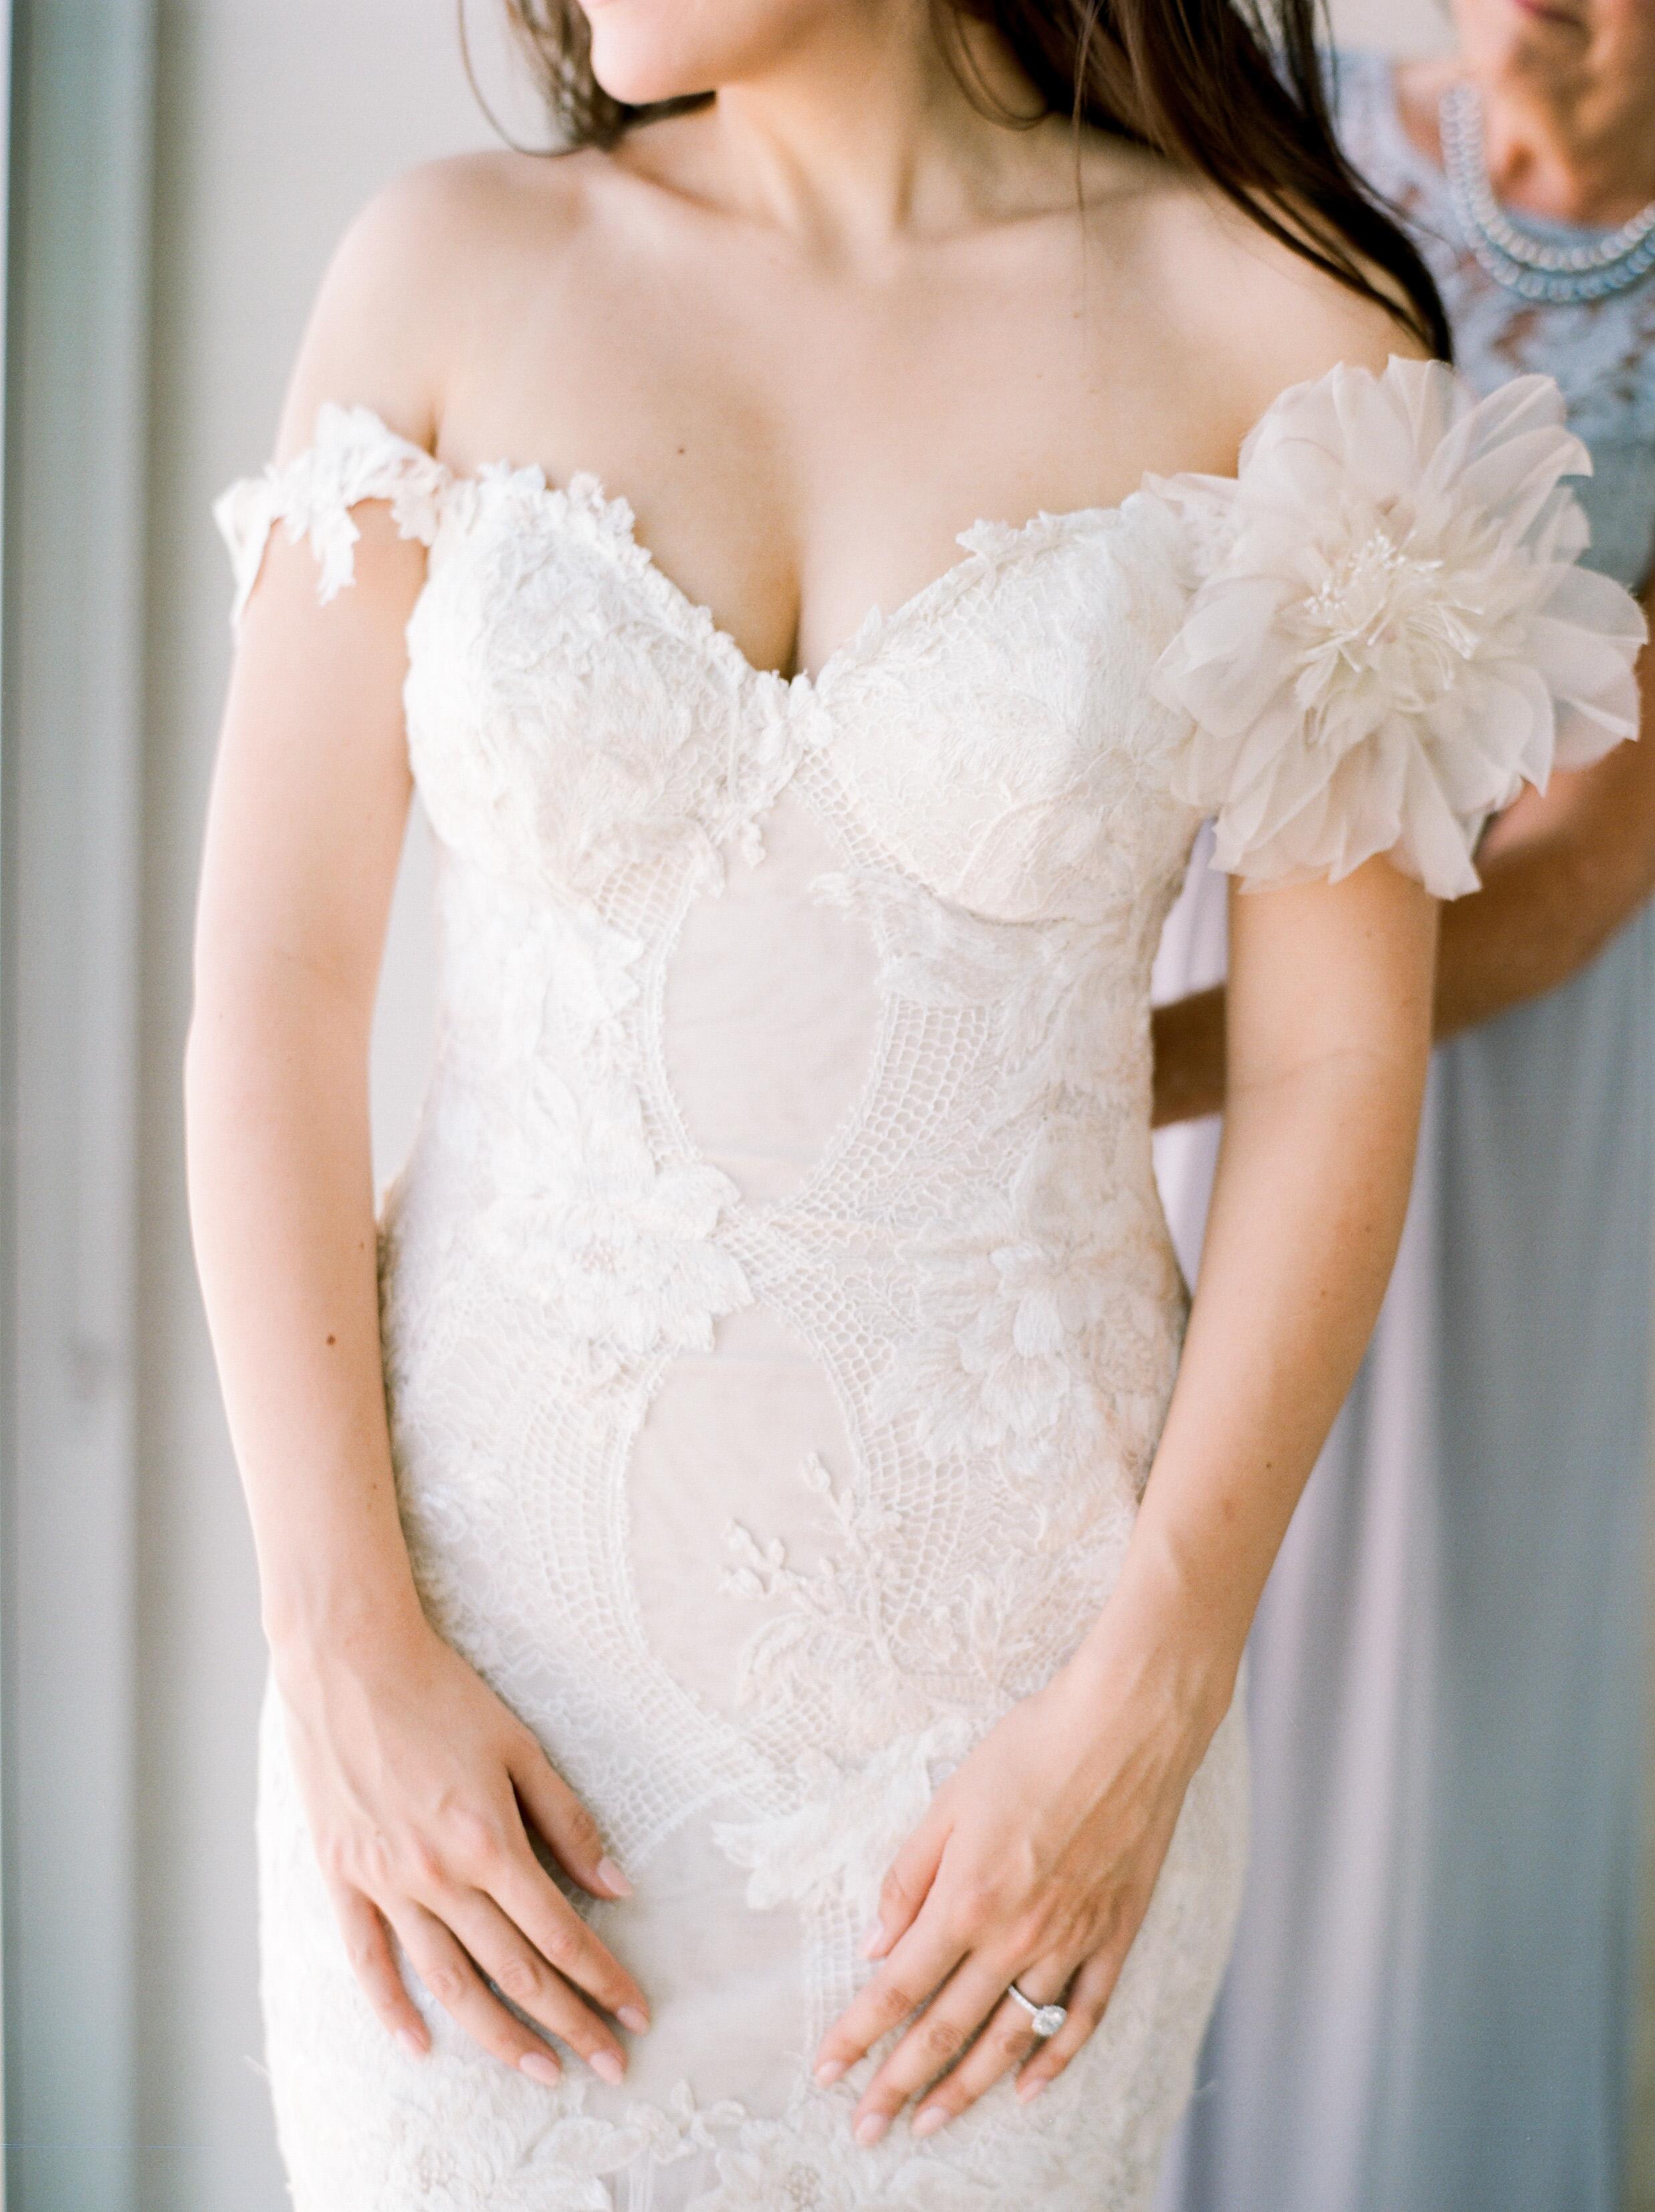 Martha-Stewart-Wedding-Dana-Fernandez-Photography-Josh-Texas-Film-Houston-Wedding-Fine-Art-Photographer-McGovern-Centennial-Gardens-Top-Best-3.jpg